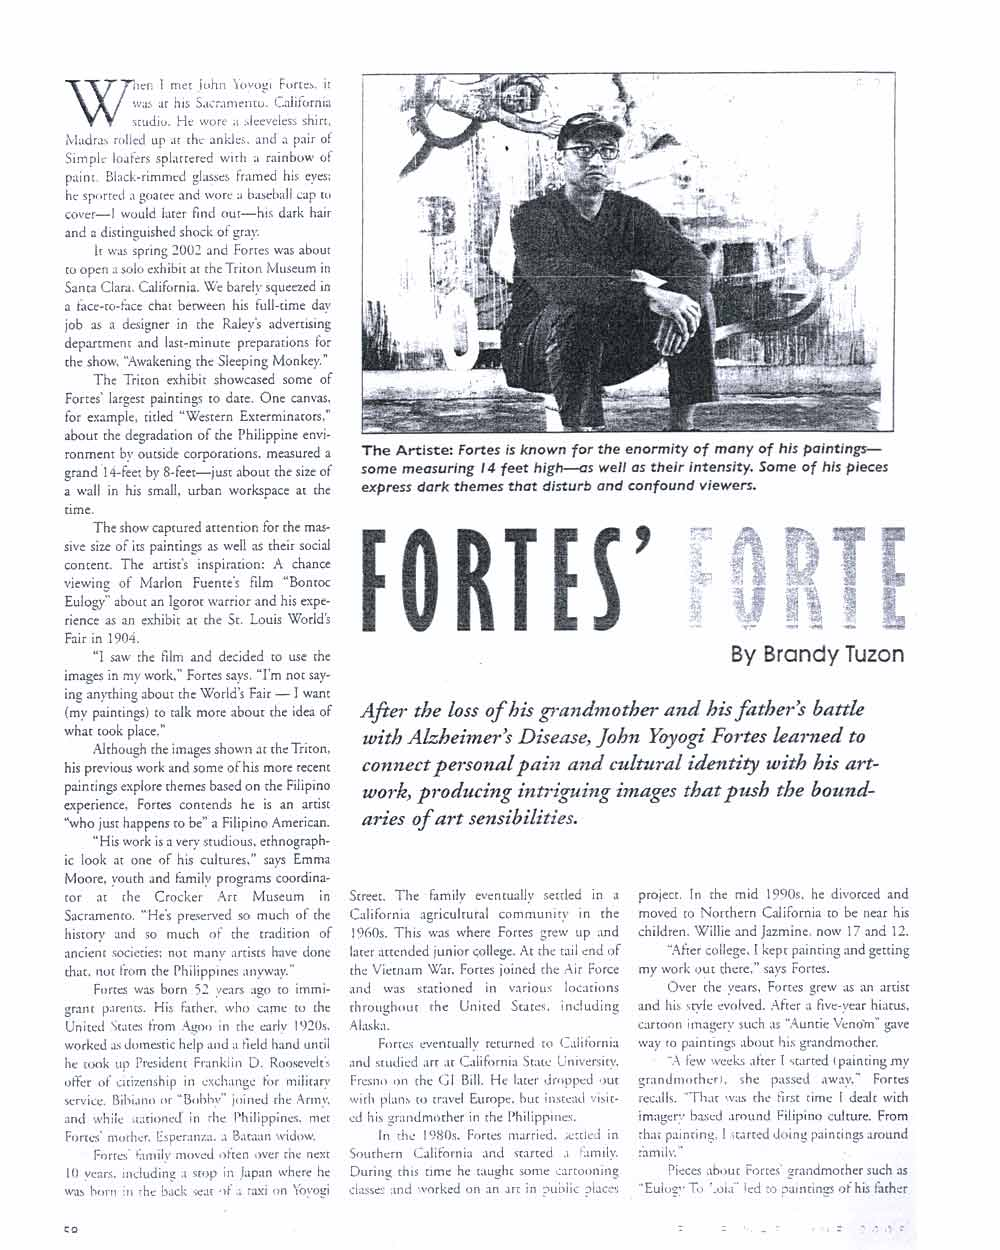 Fortes' Forte, article, pg 1